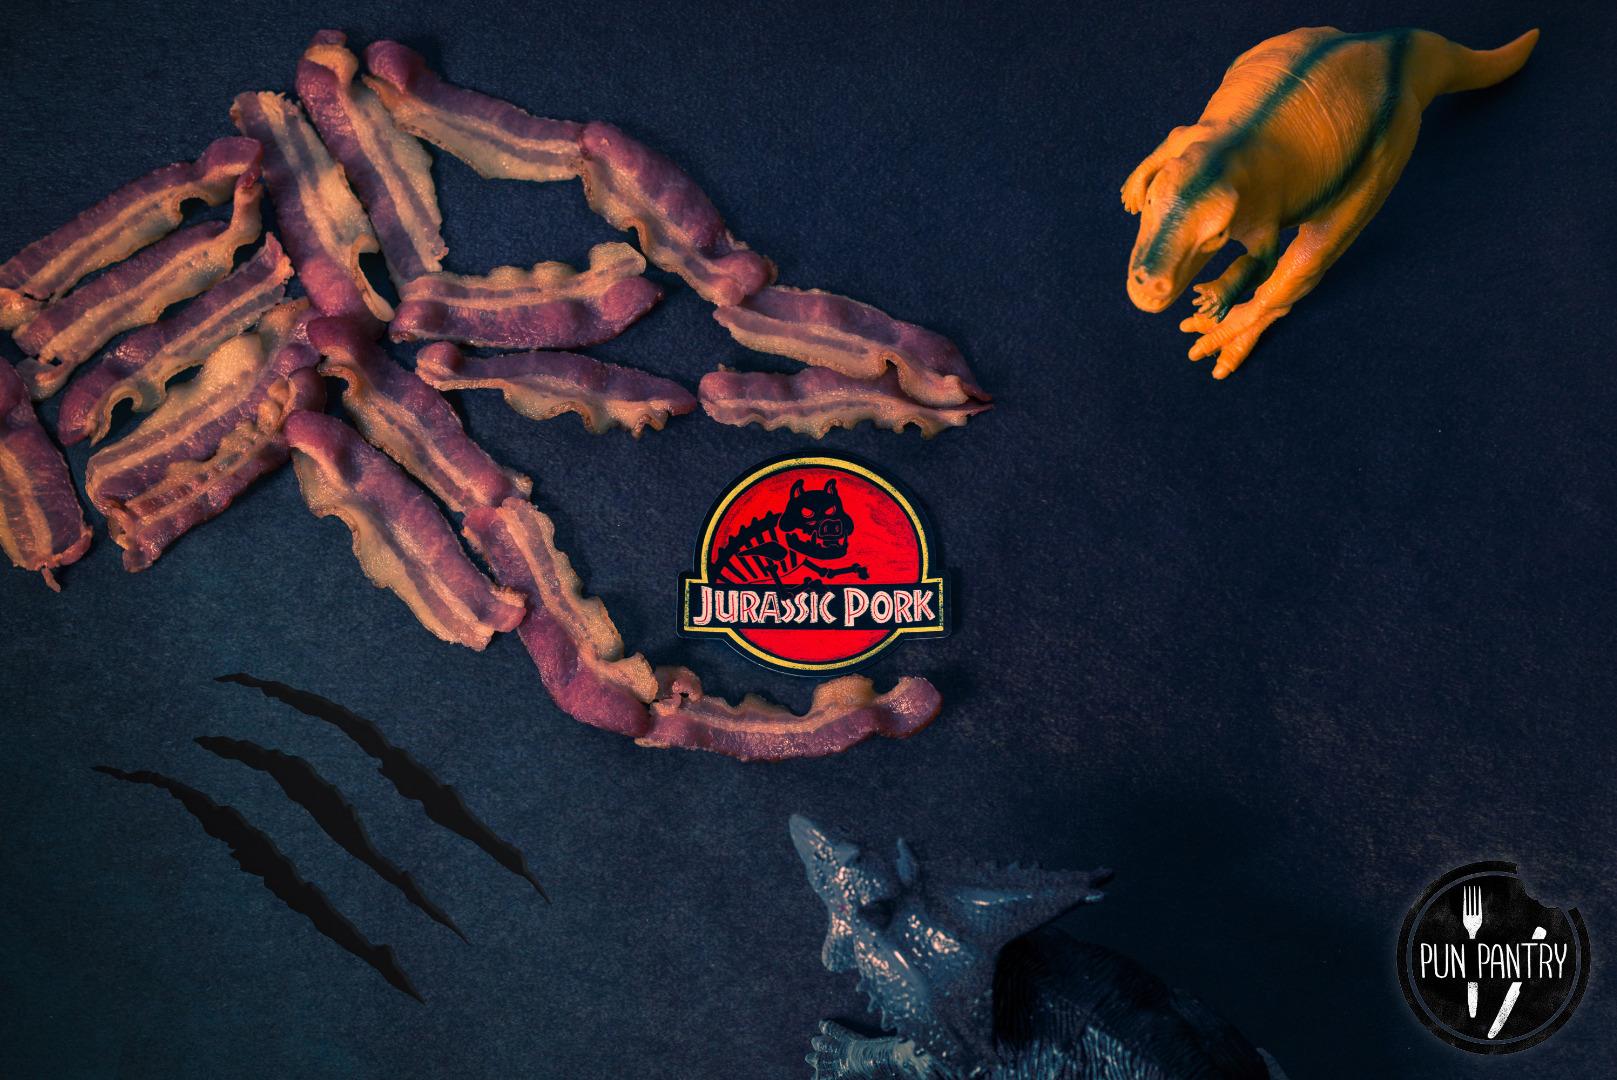 Jurassicpork magnet logo